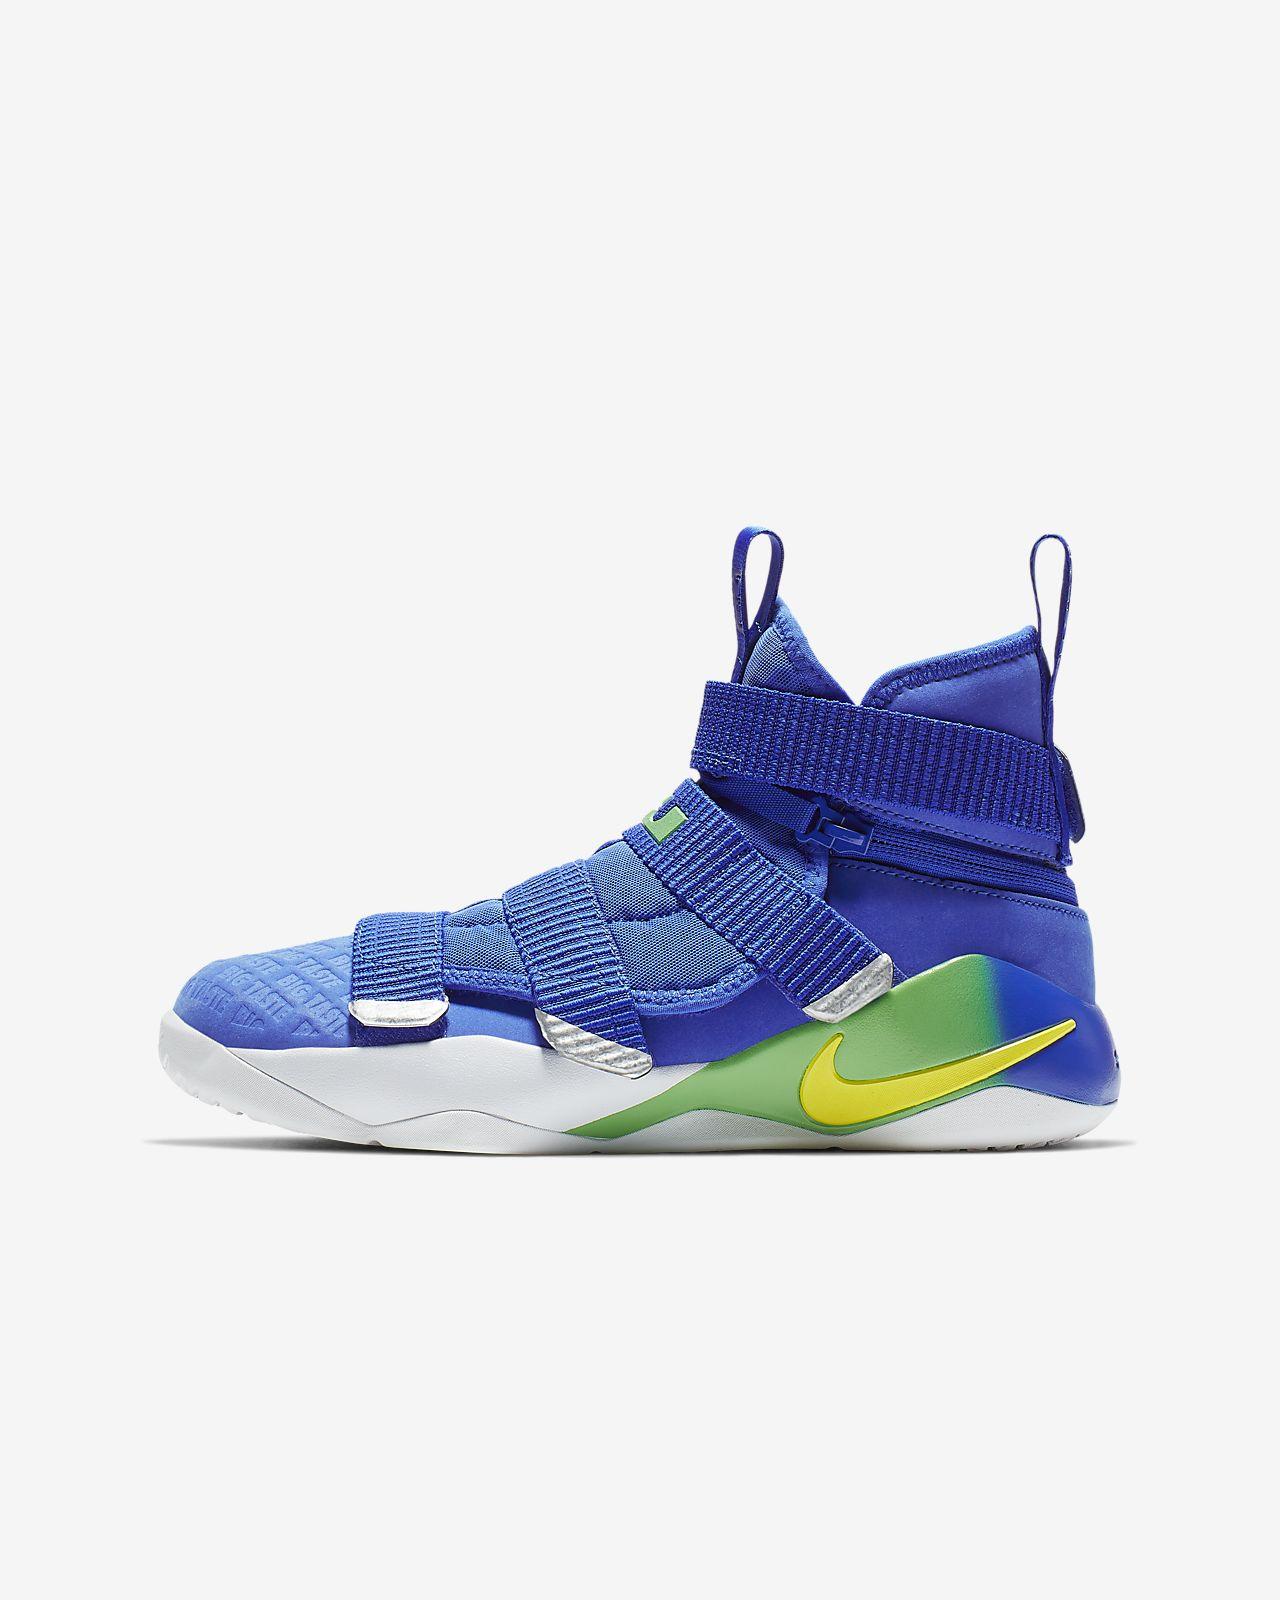 cheap for discount de959 fa875 LeBron Soldier 11 FlyEase Older Kids' Basketball Shoe